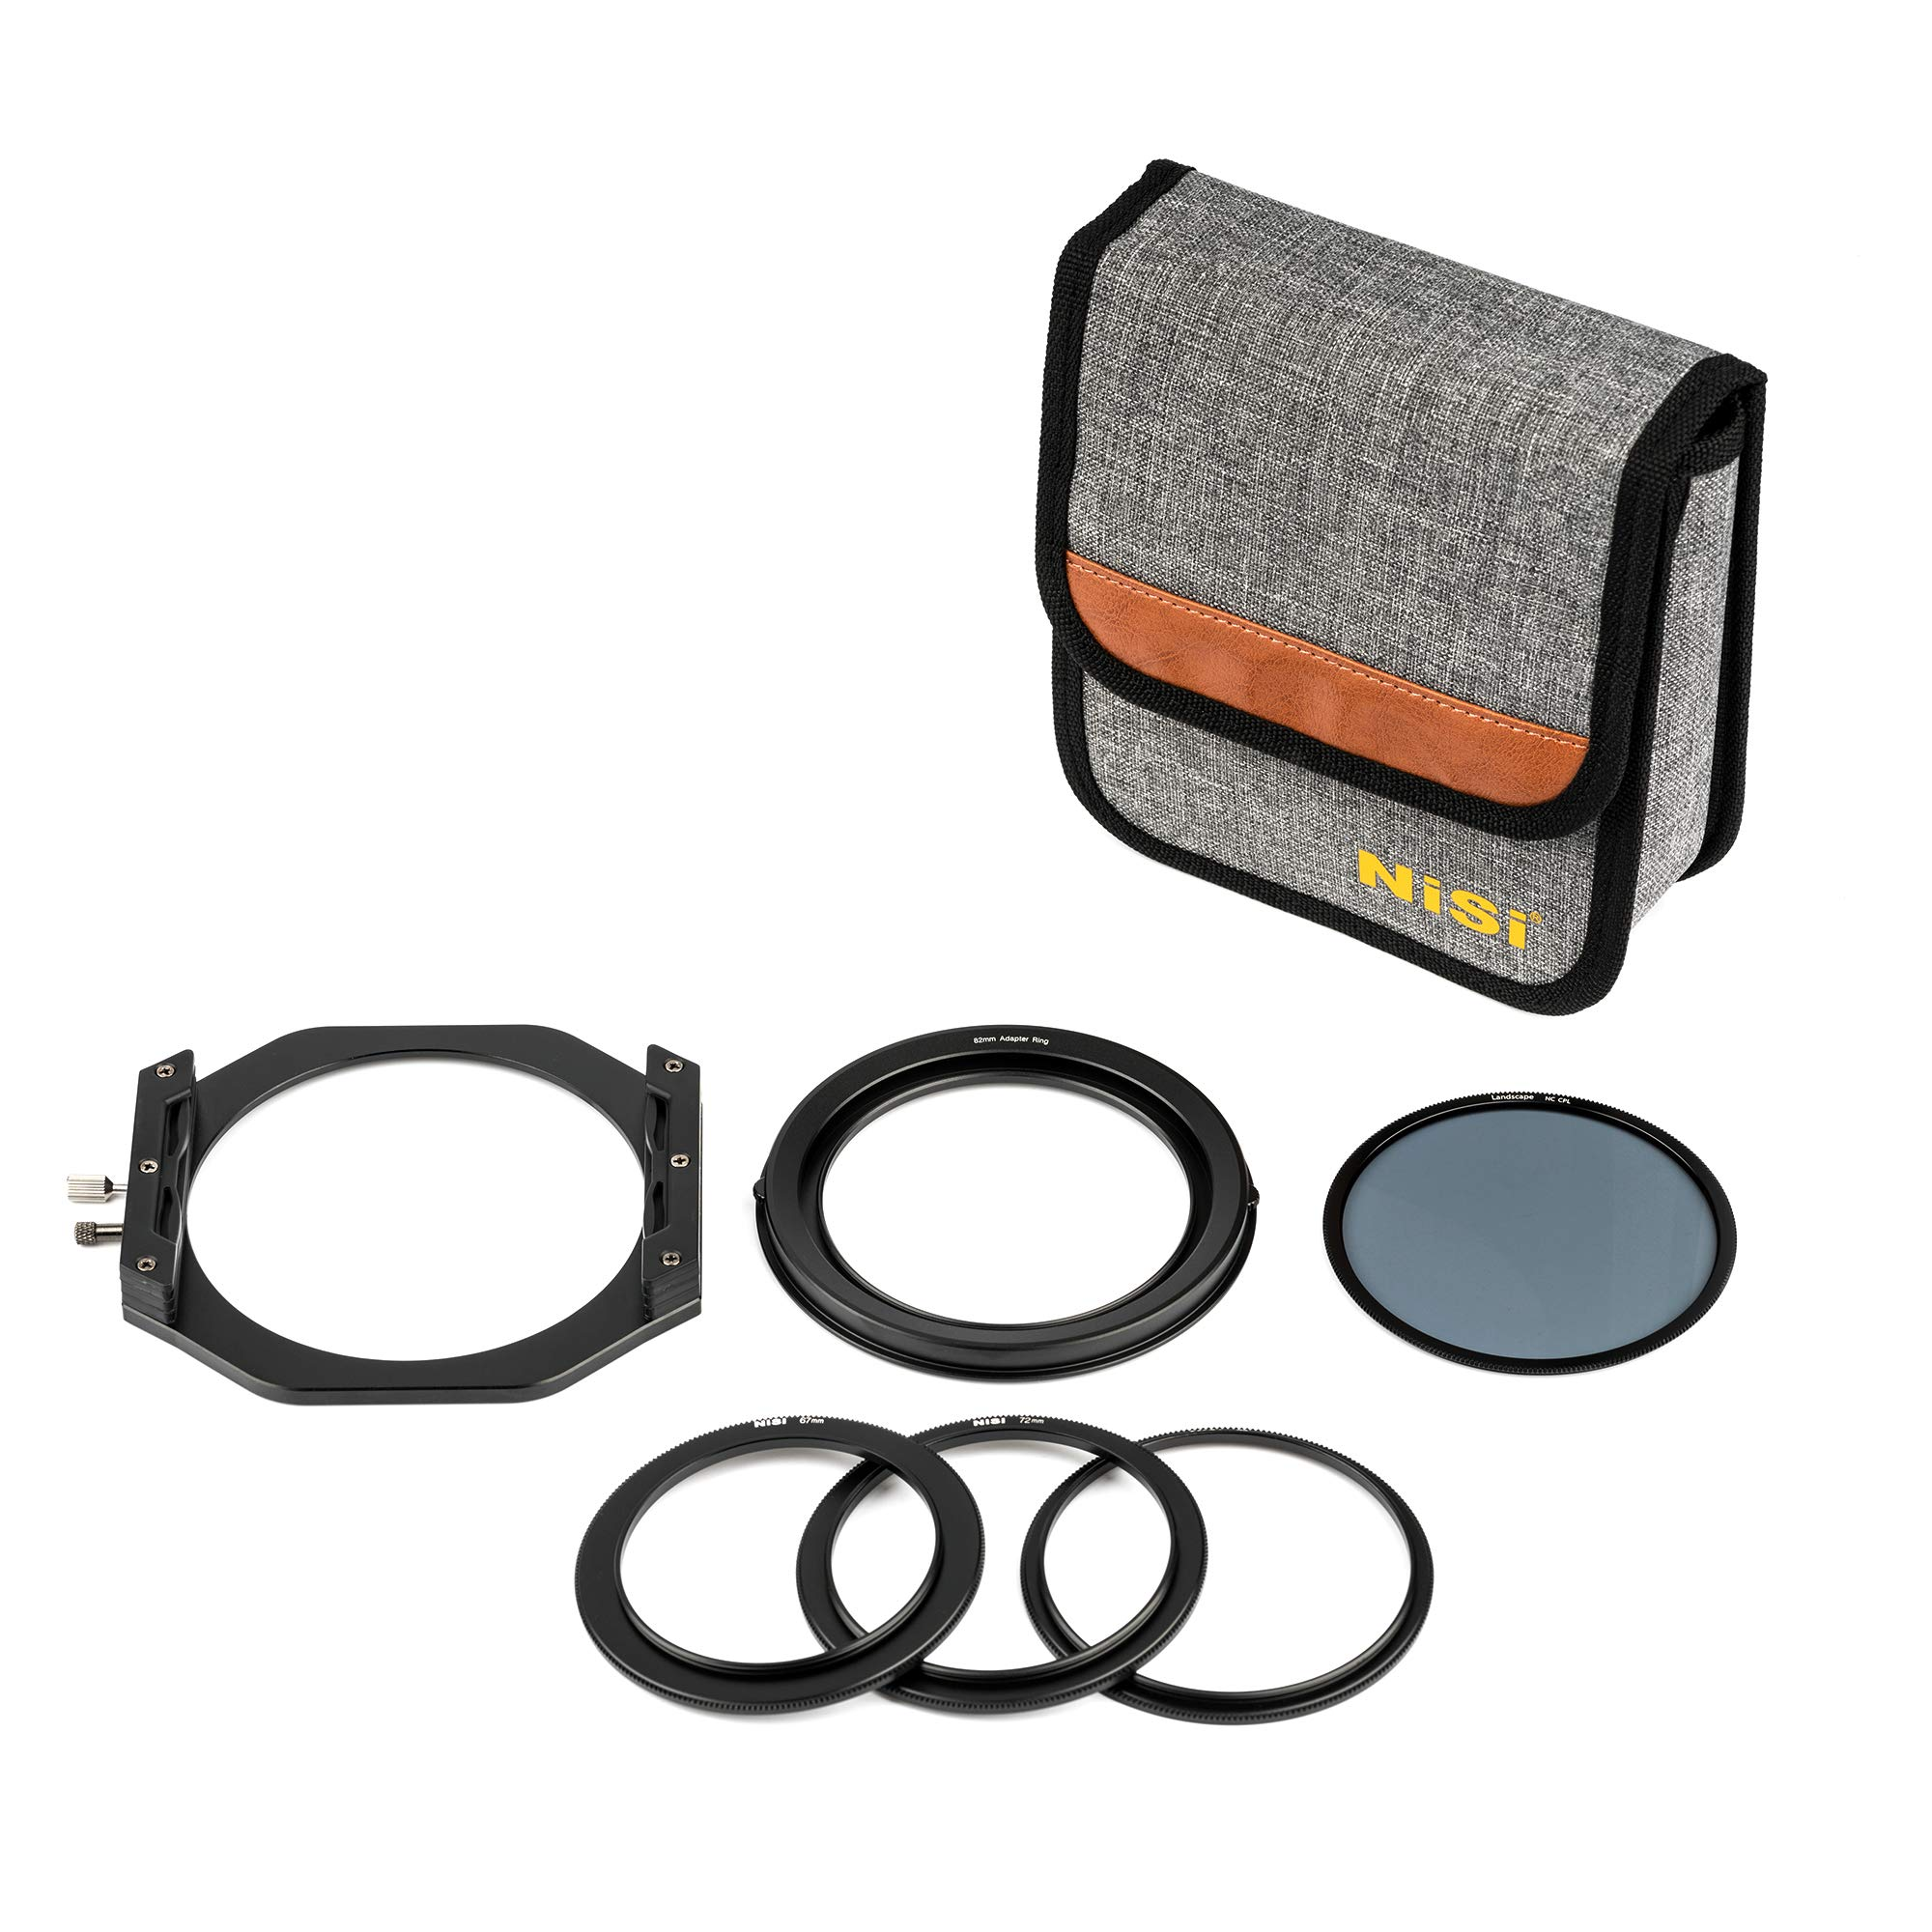 NiSi V6 Filter Holder Kit - 100mm System with Pro CPL & Adapter Rings (NIP-FH100-V6)